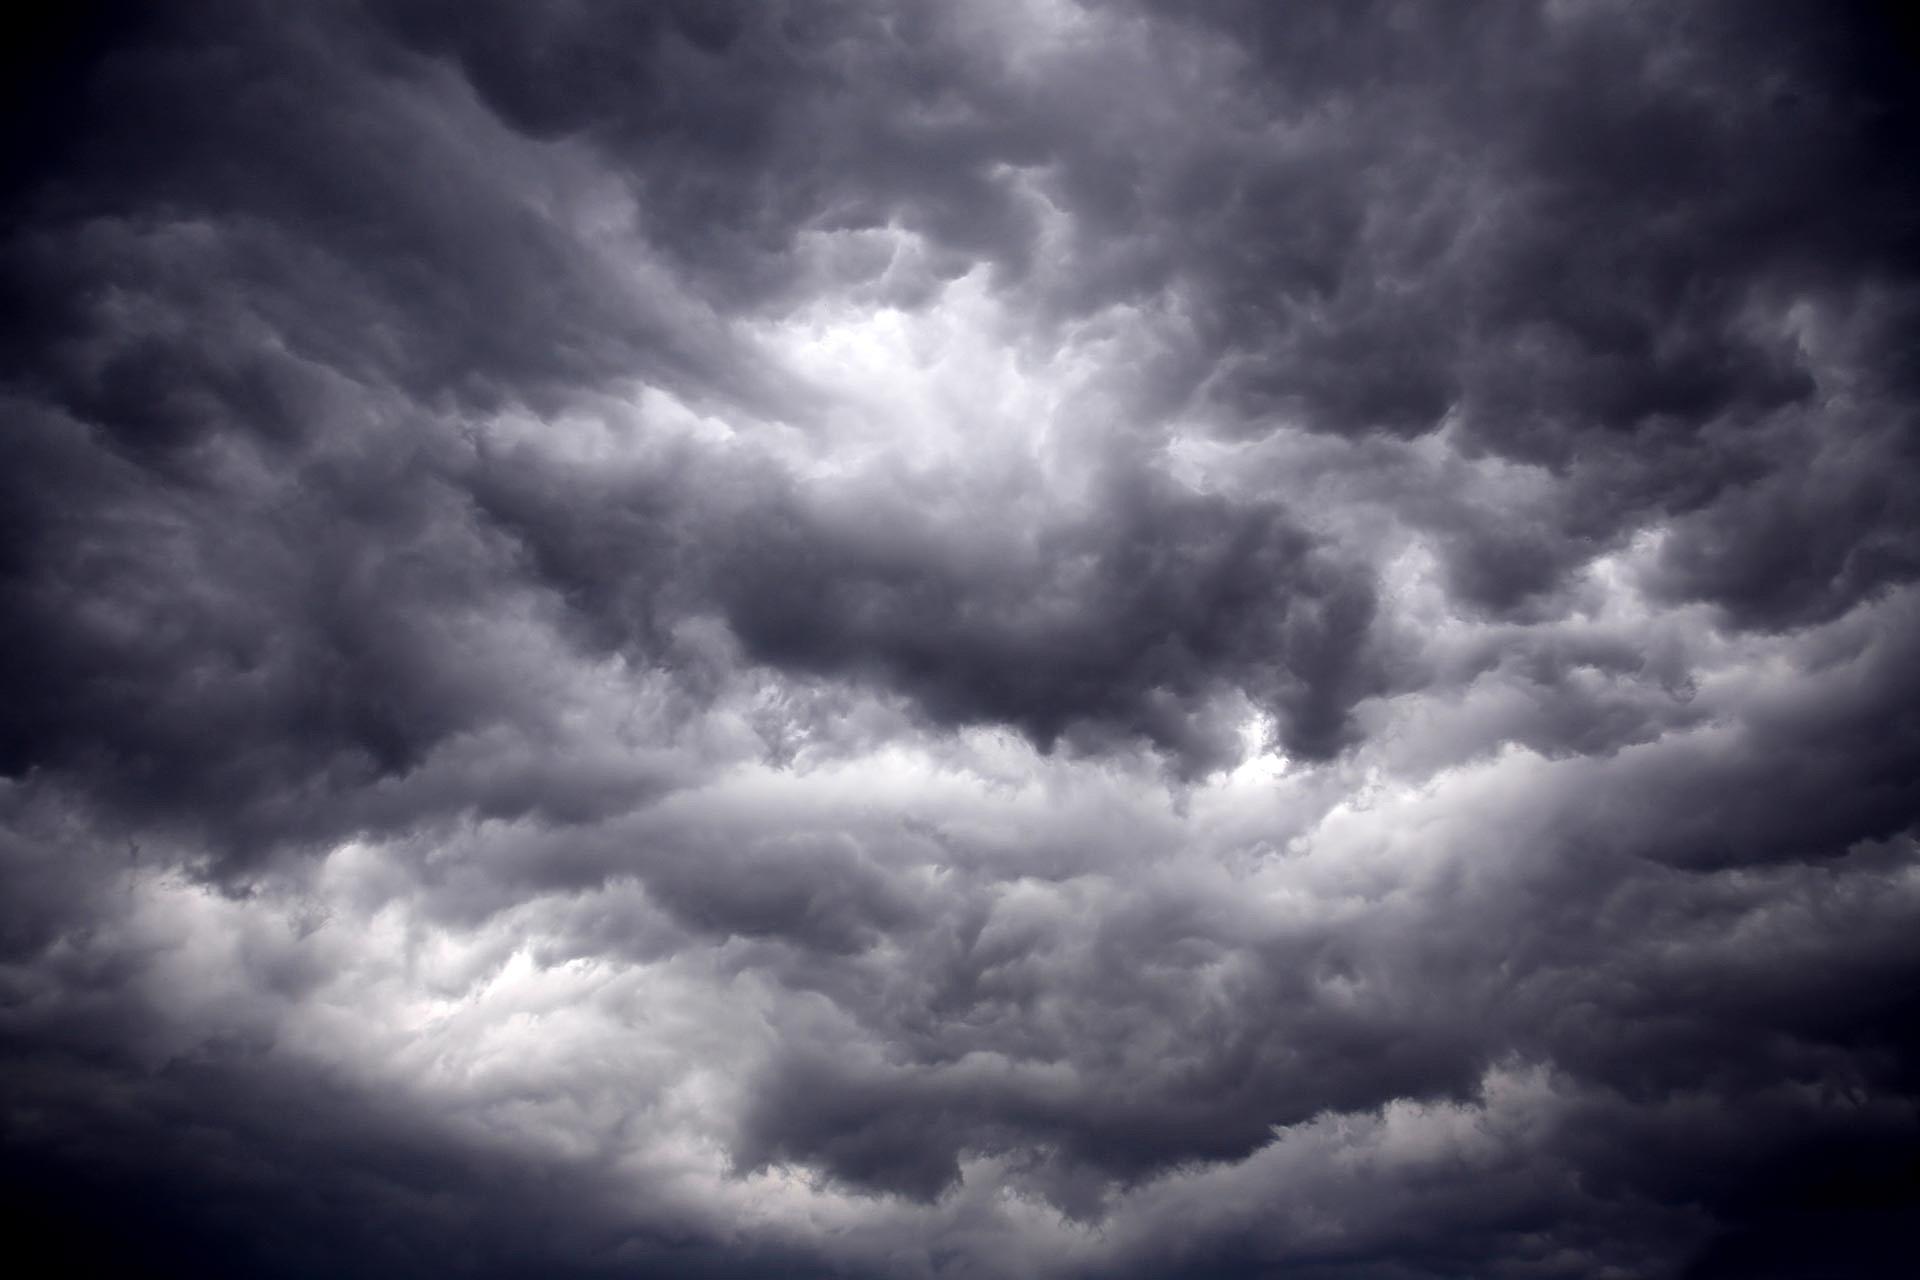 iicoc.net | Storm Clouds